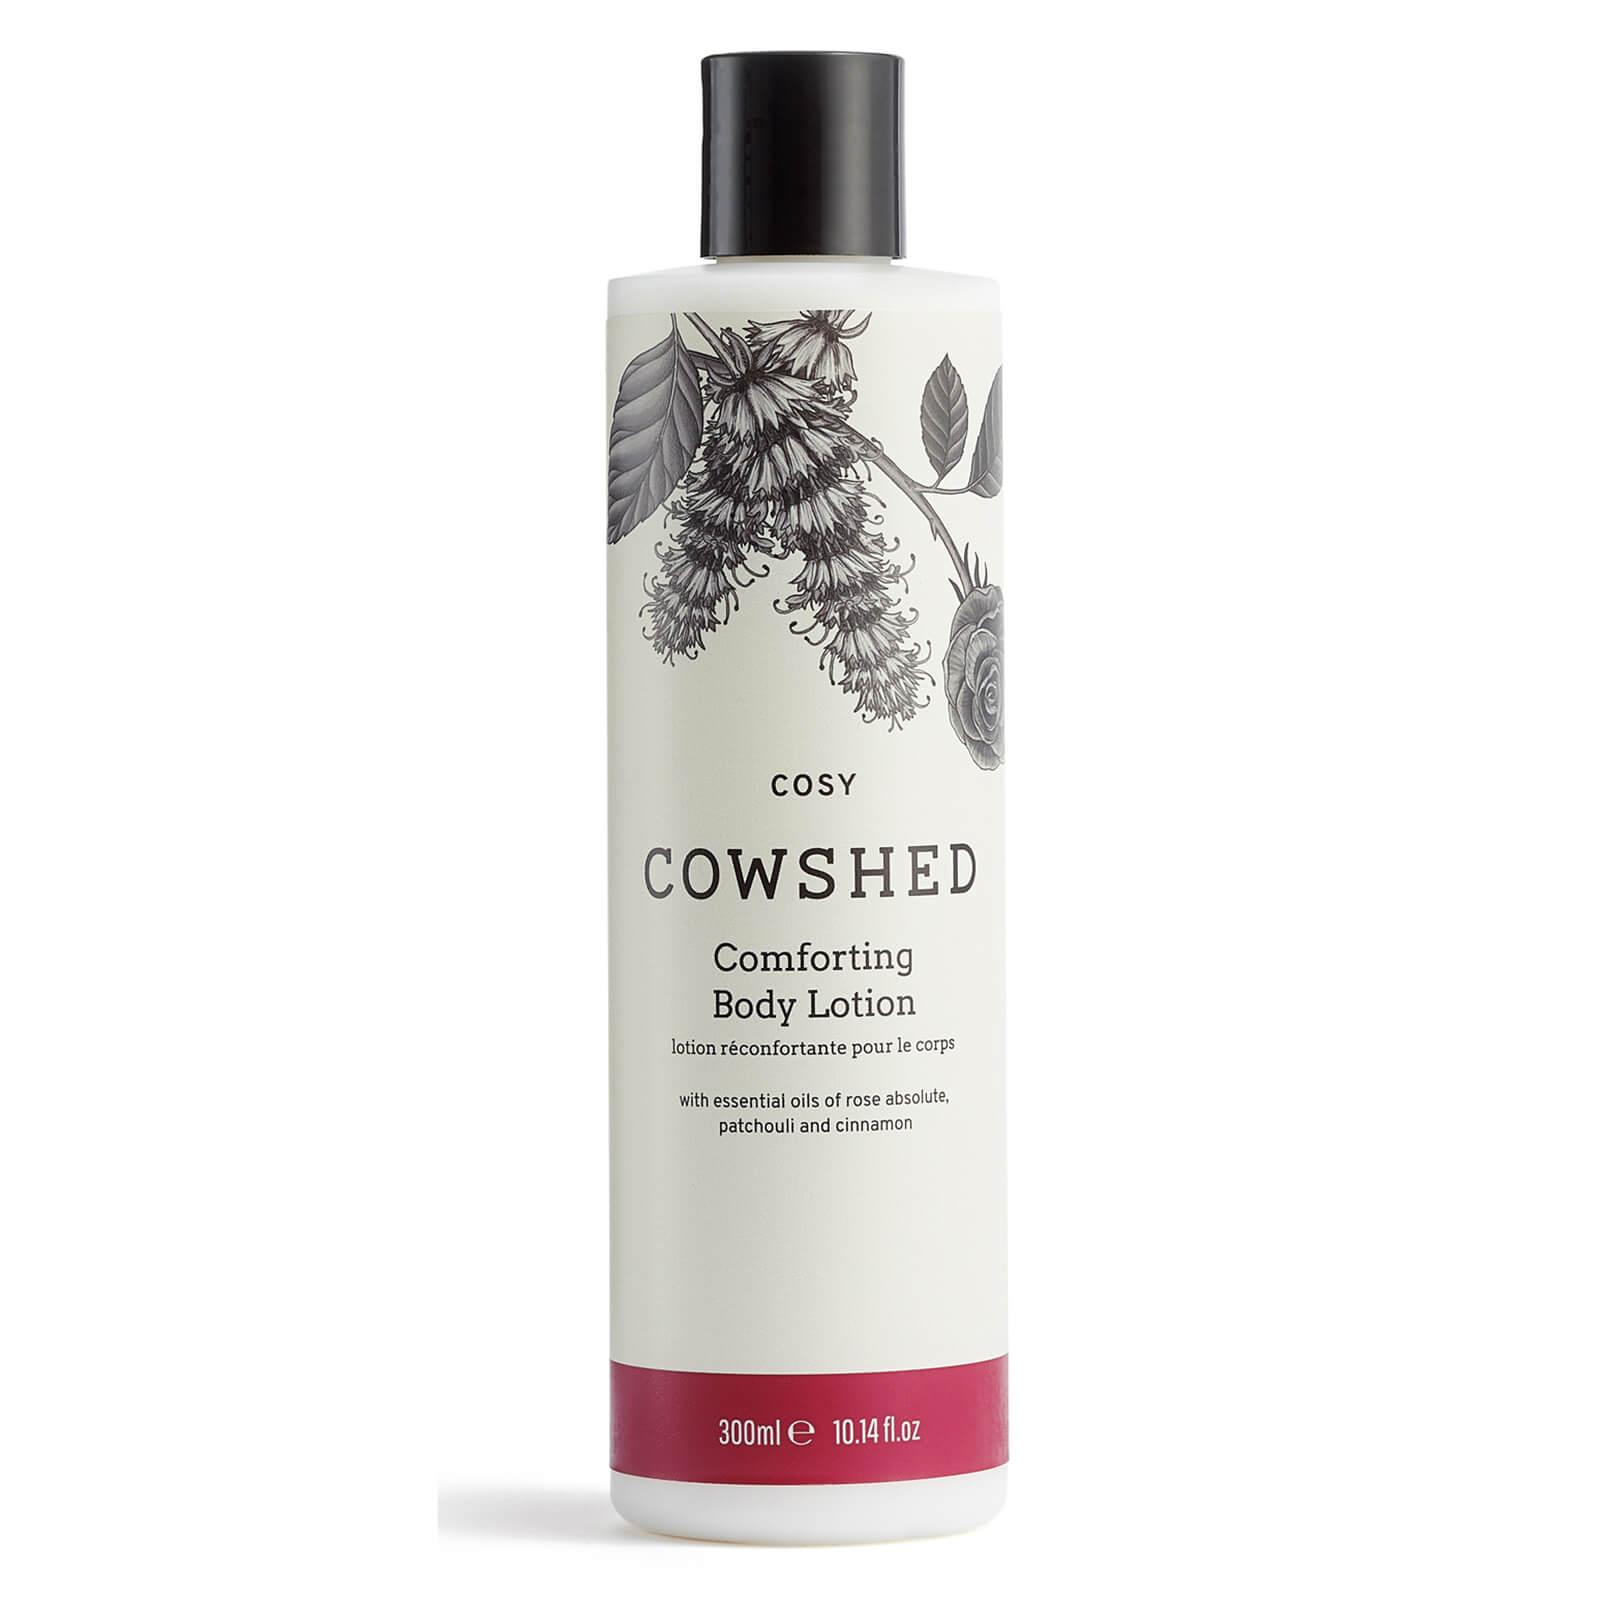 Купить Cowshed COSY Comforting Body Lotion 300ml